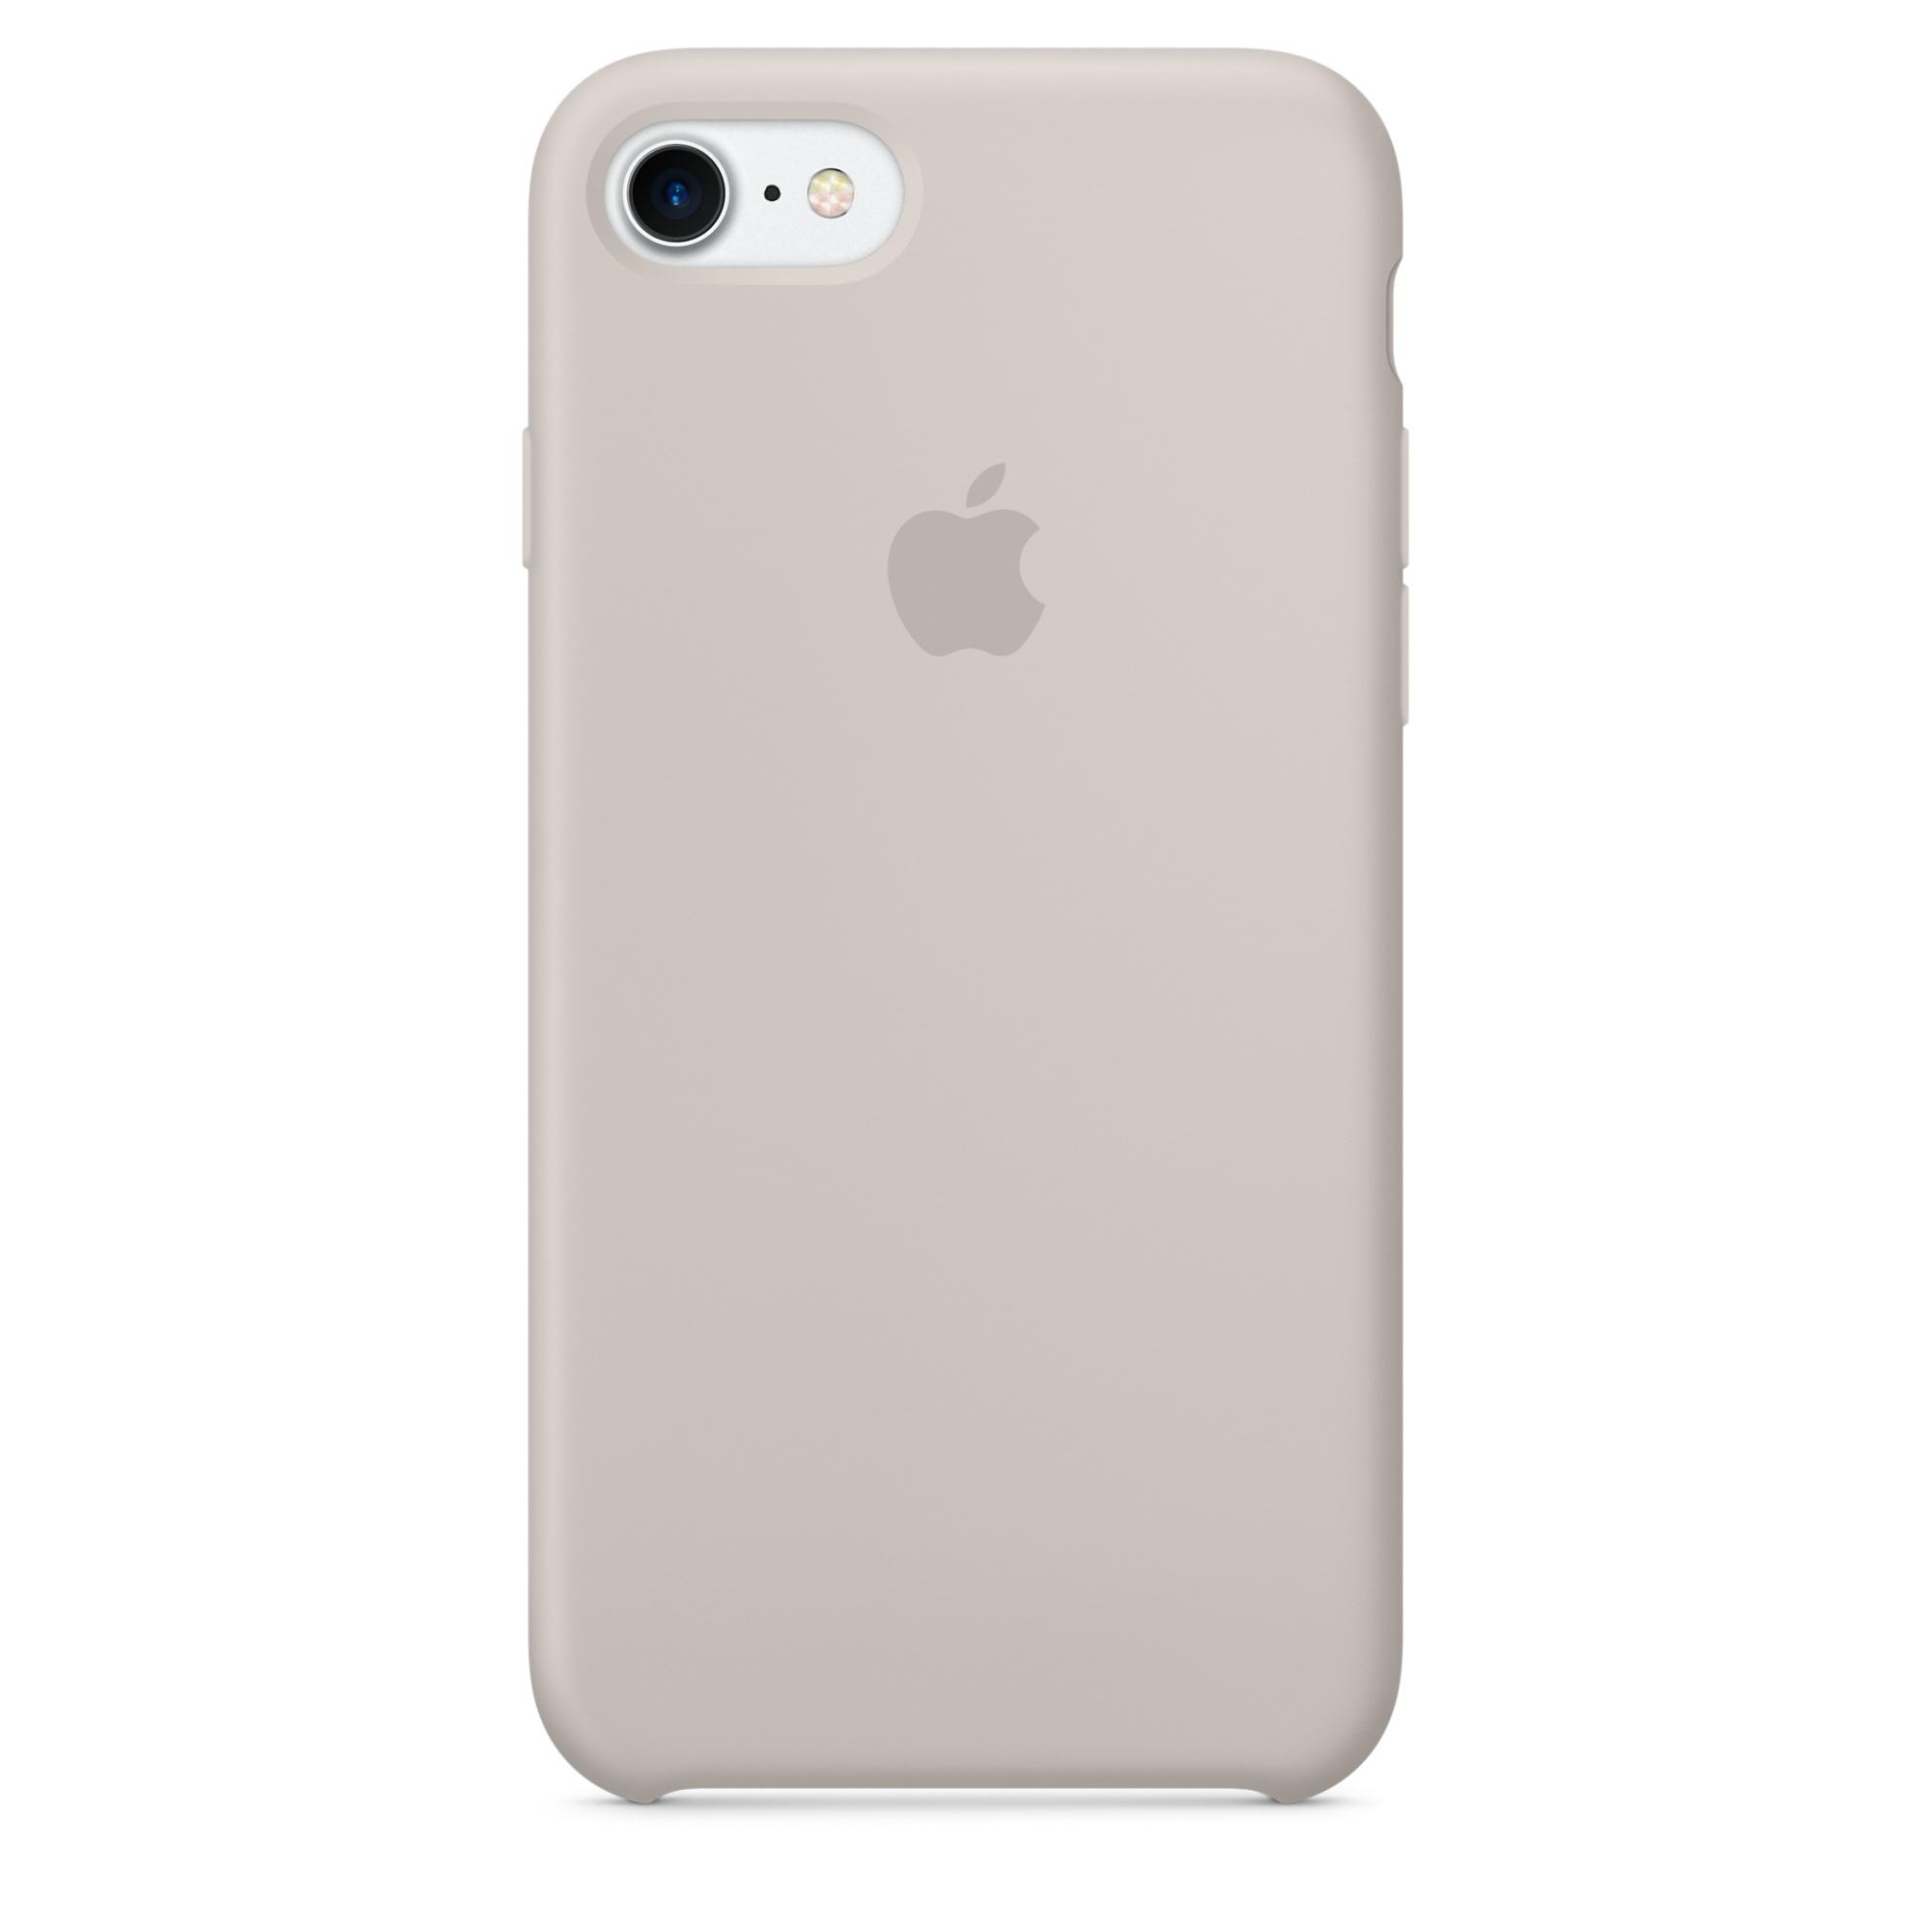 Ochranný kryt pro iPhone 7 - Apple, Silicone Case Stone